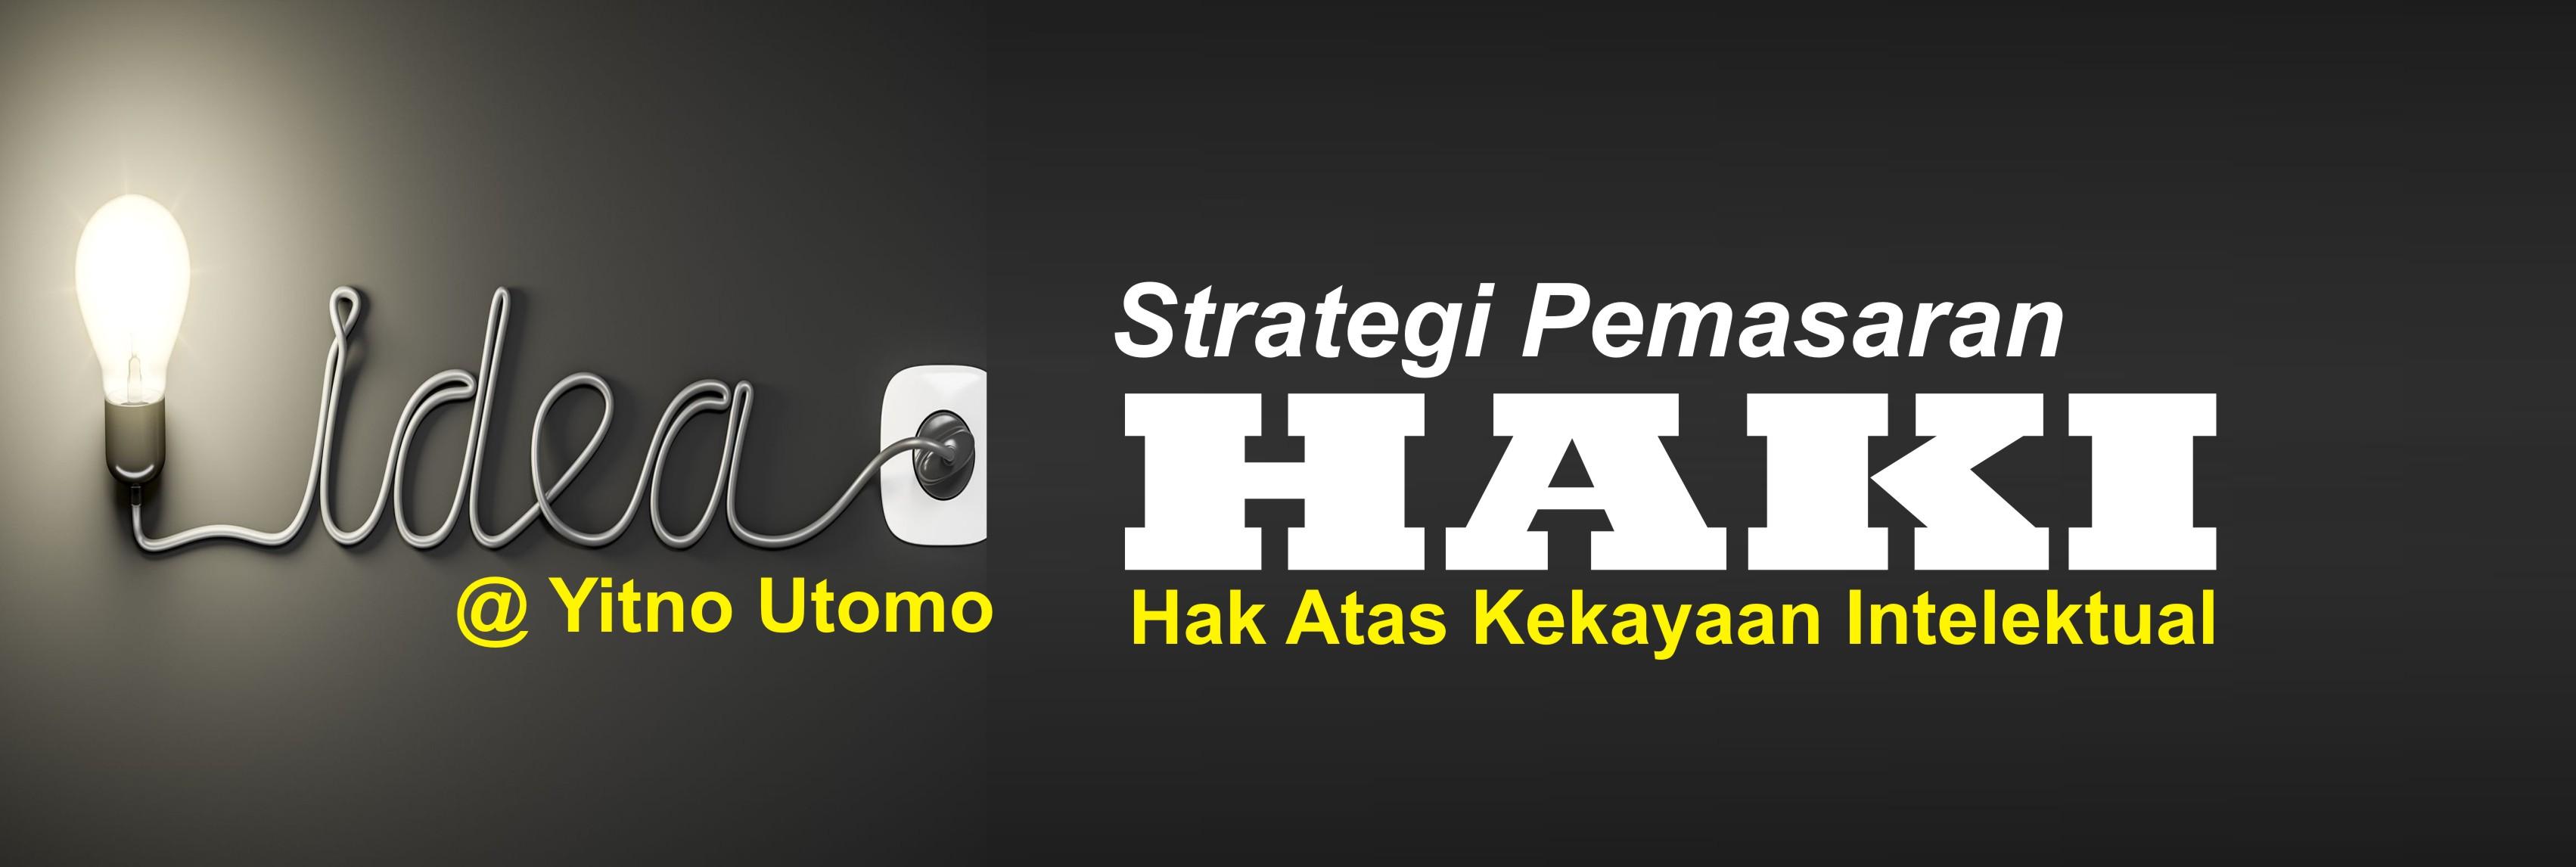 1.2 Strategi Pemasaran dan HAKI